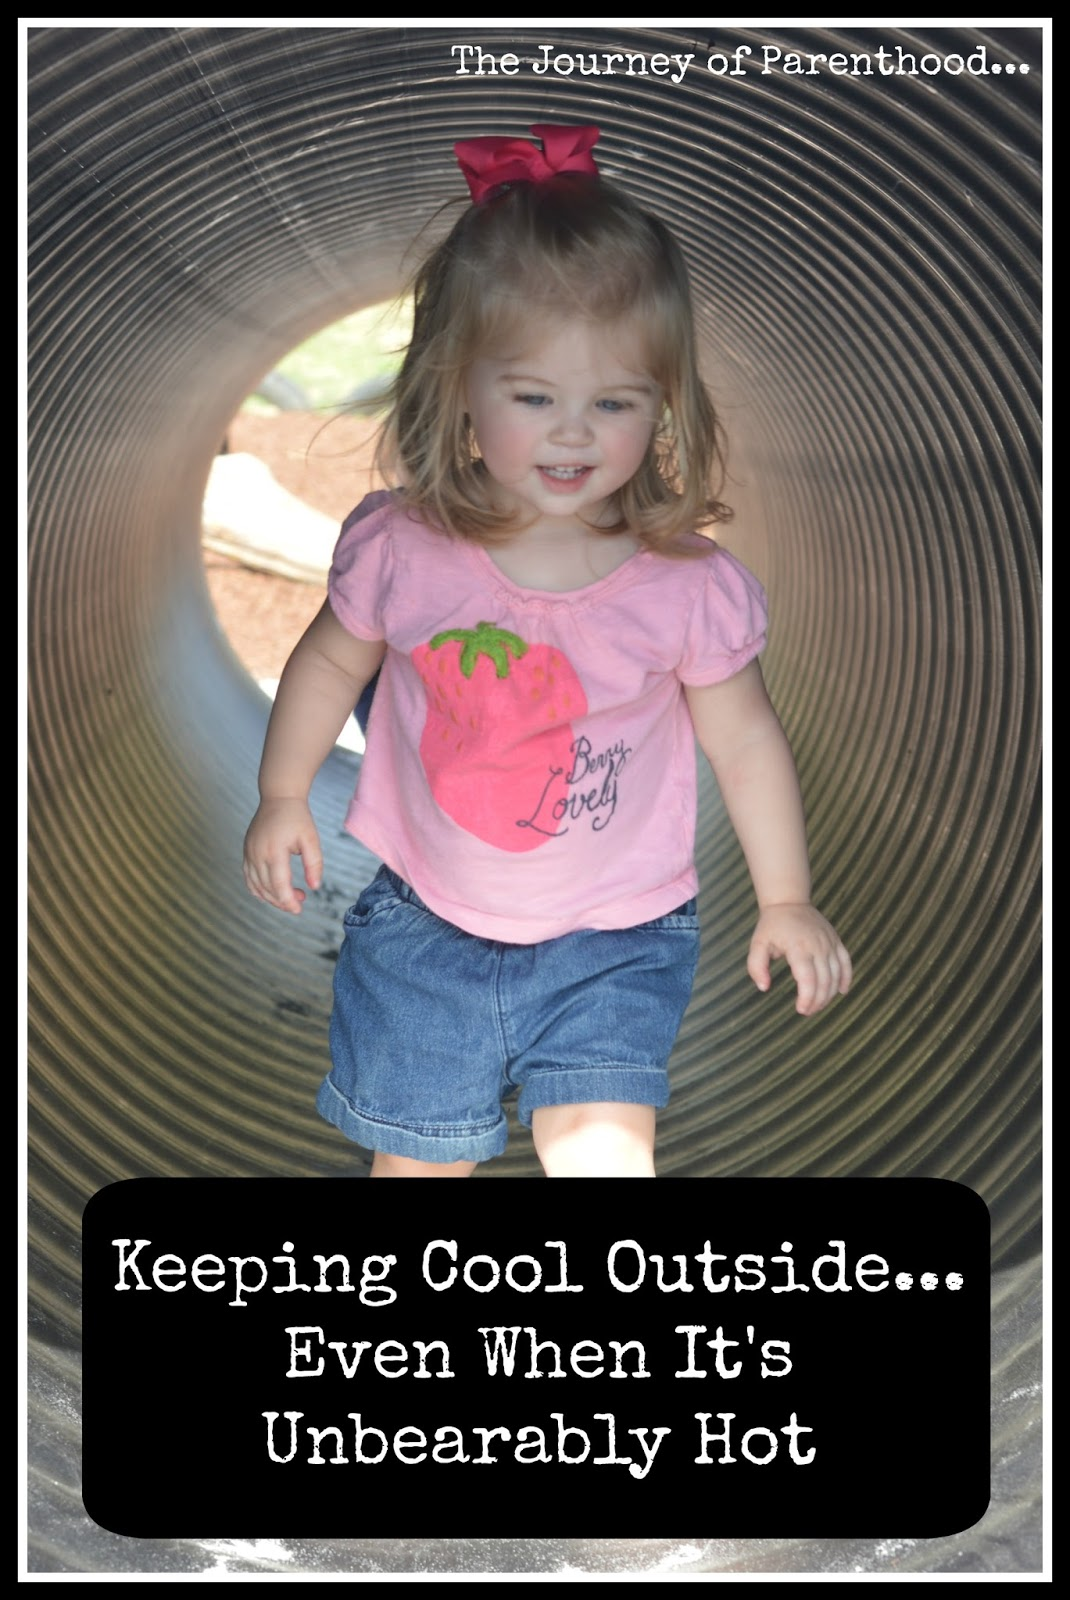 Keeping Cool Outside When It's Unbearably Hot